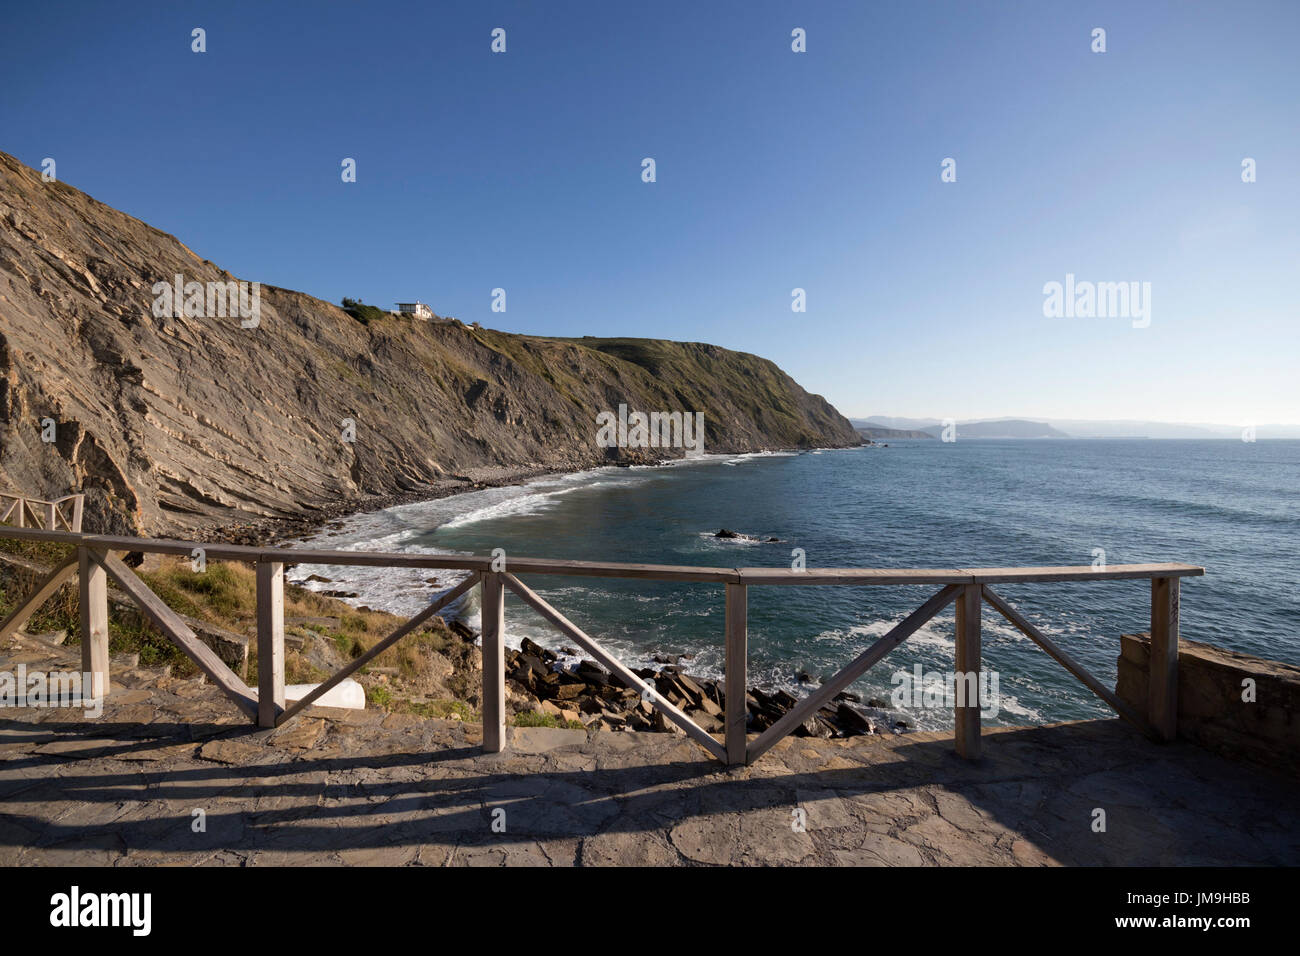 Viewpoint of the Barrika cliff (Bizkaia, Euskadi, Spain). - Stock Image